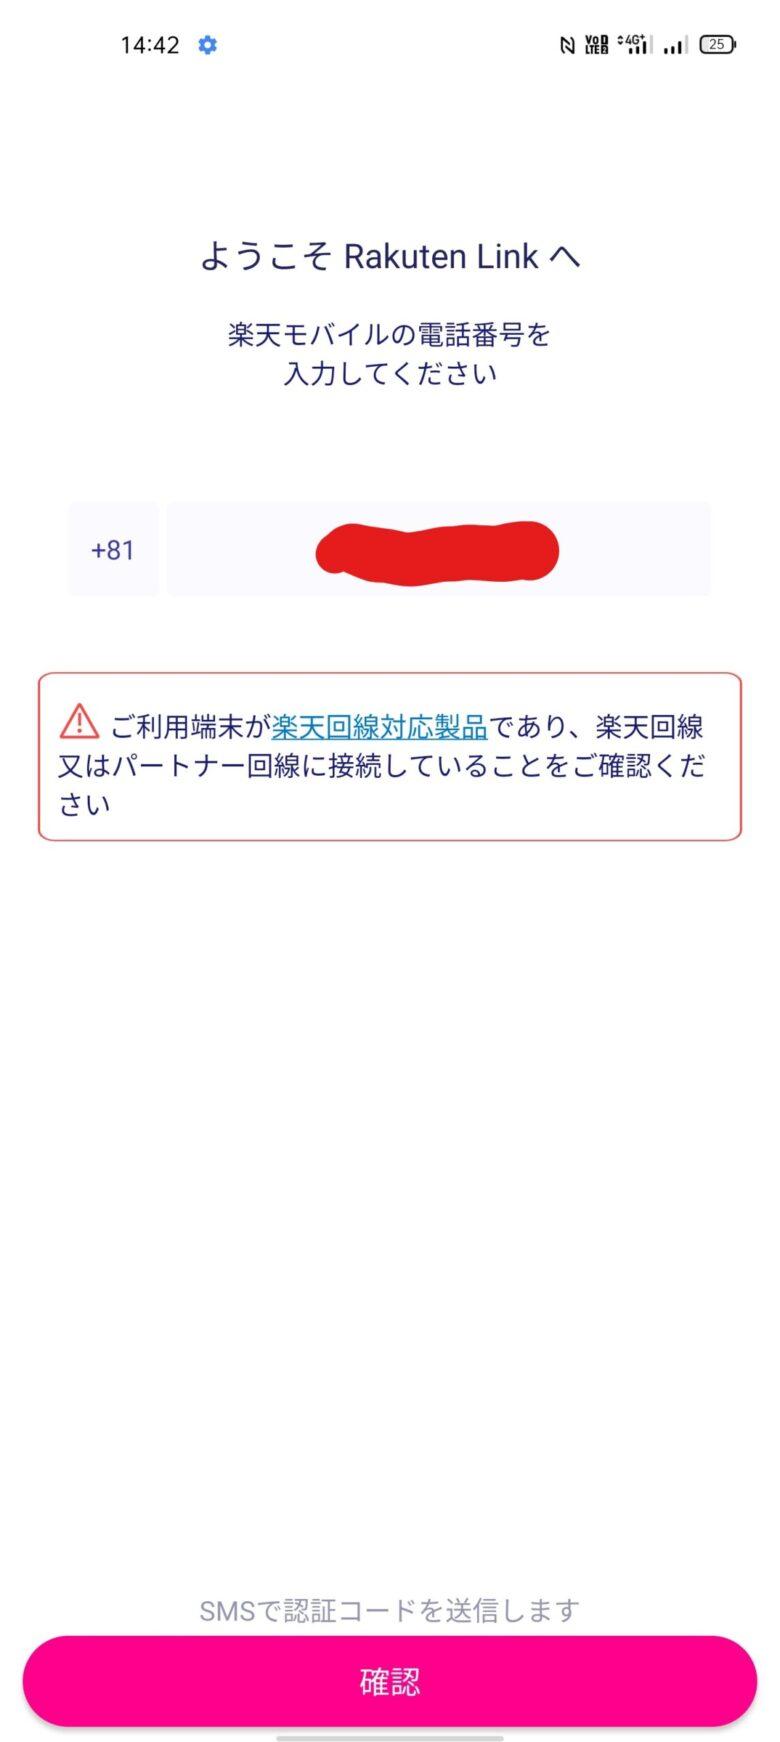 OPPO Find X3 Proの楽天リンク認証画面。